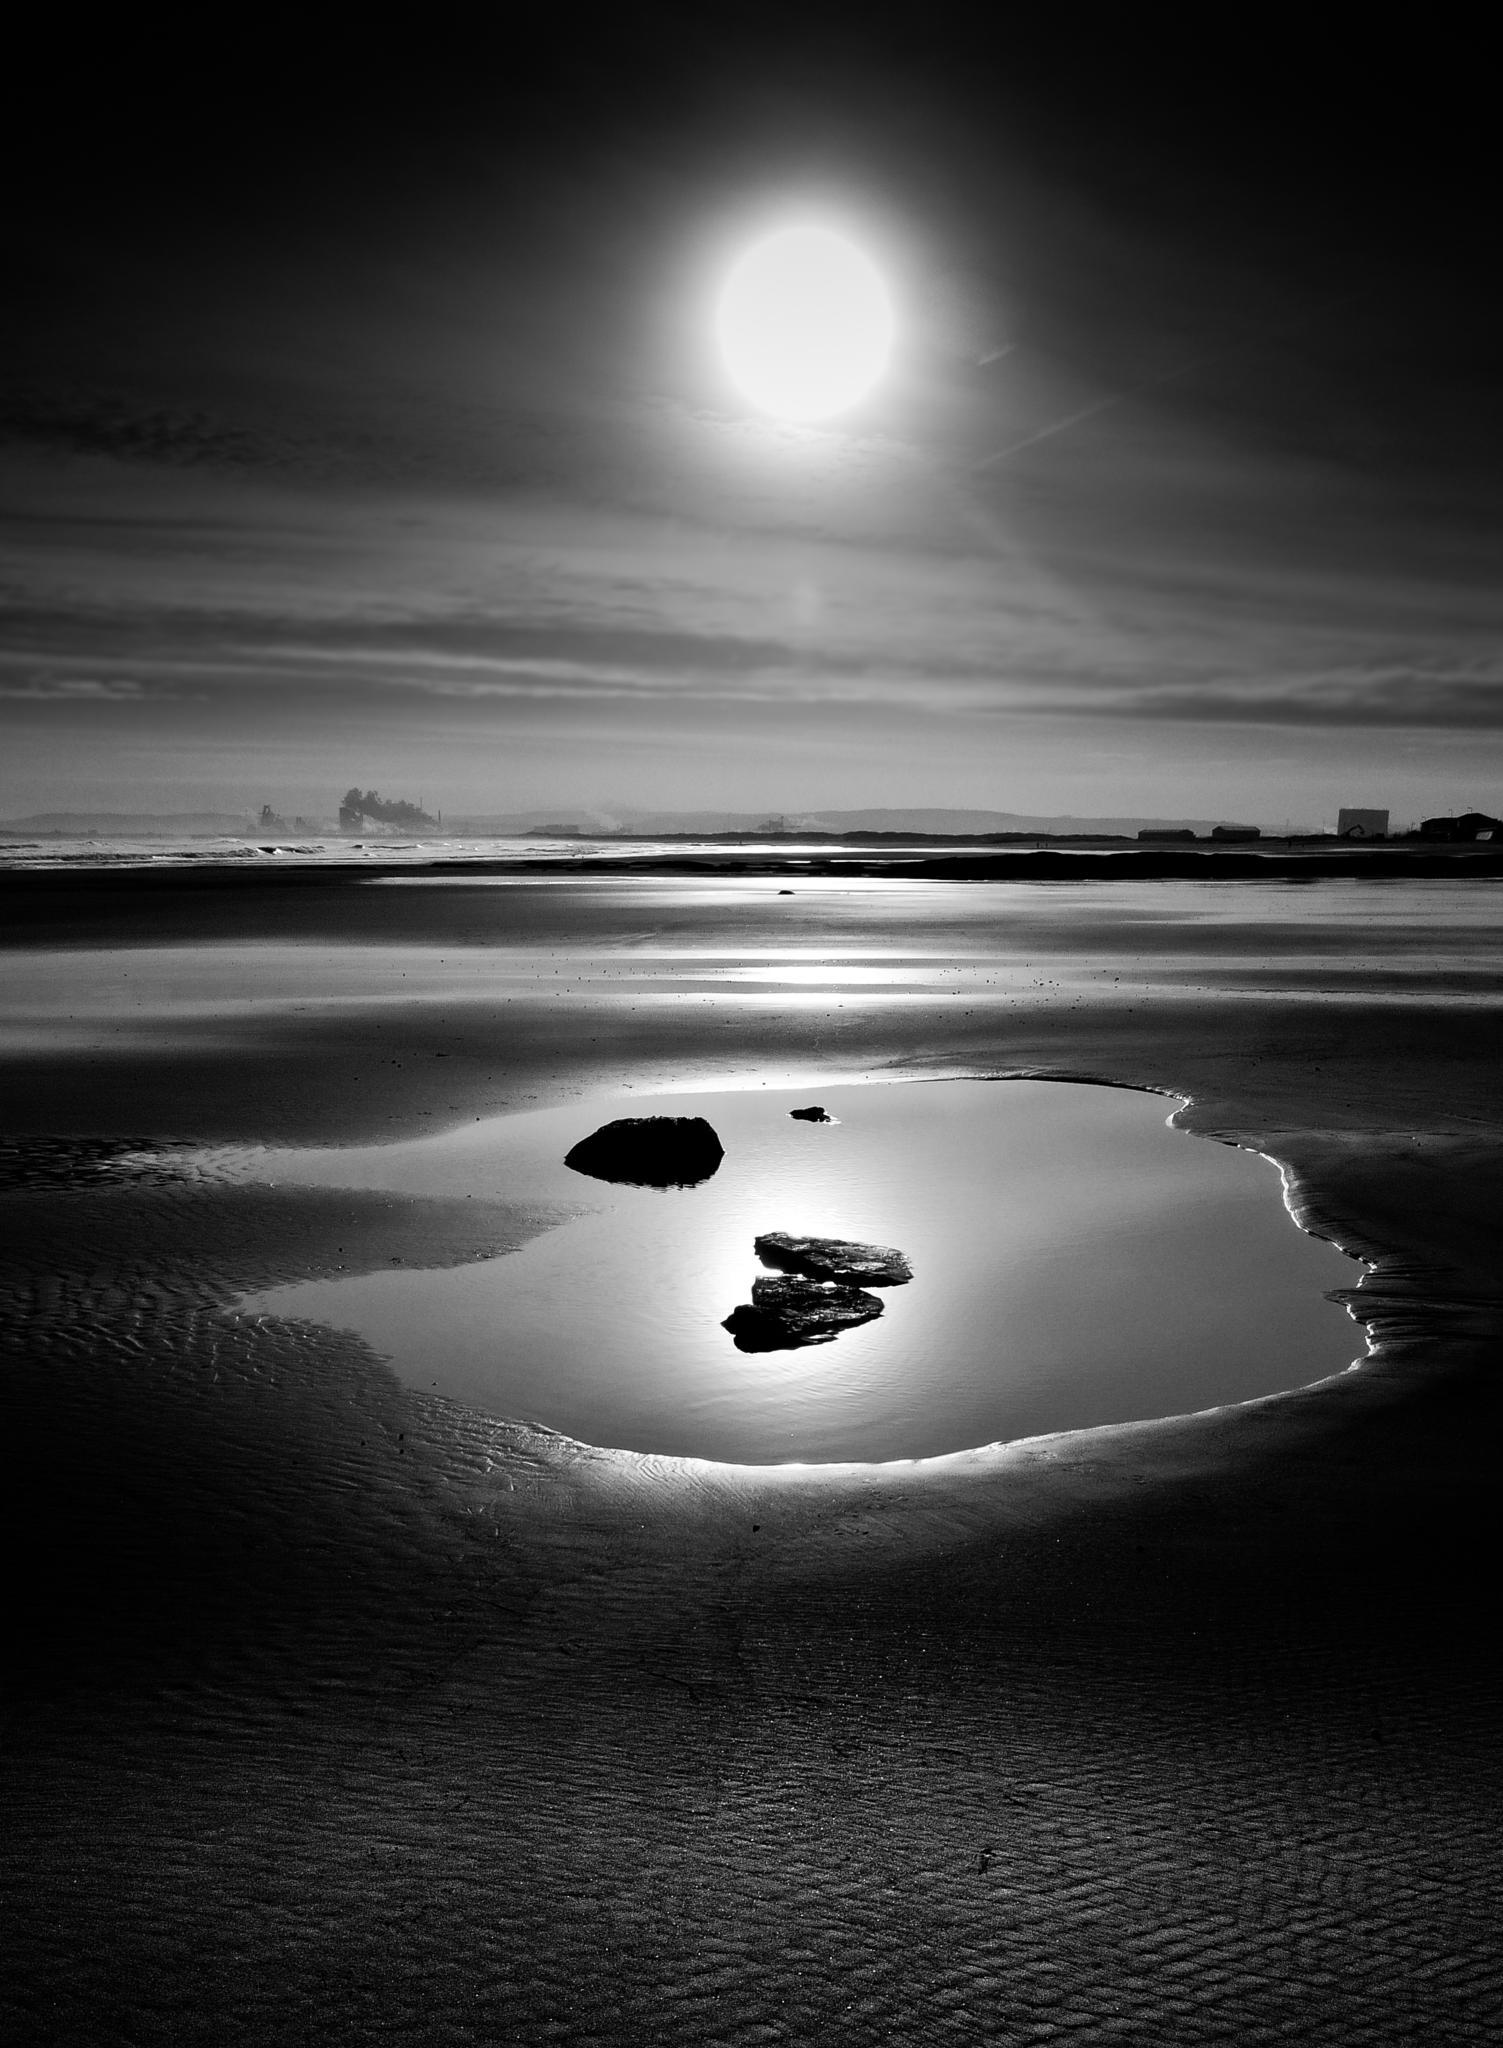 Beach by Peter Edwardo Vicente.